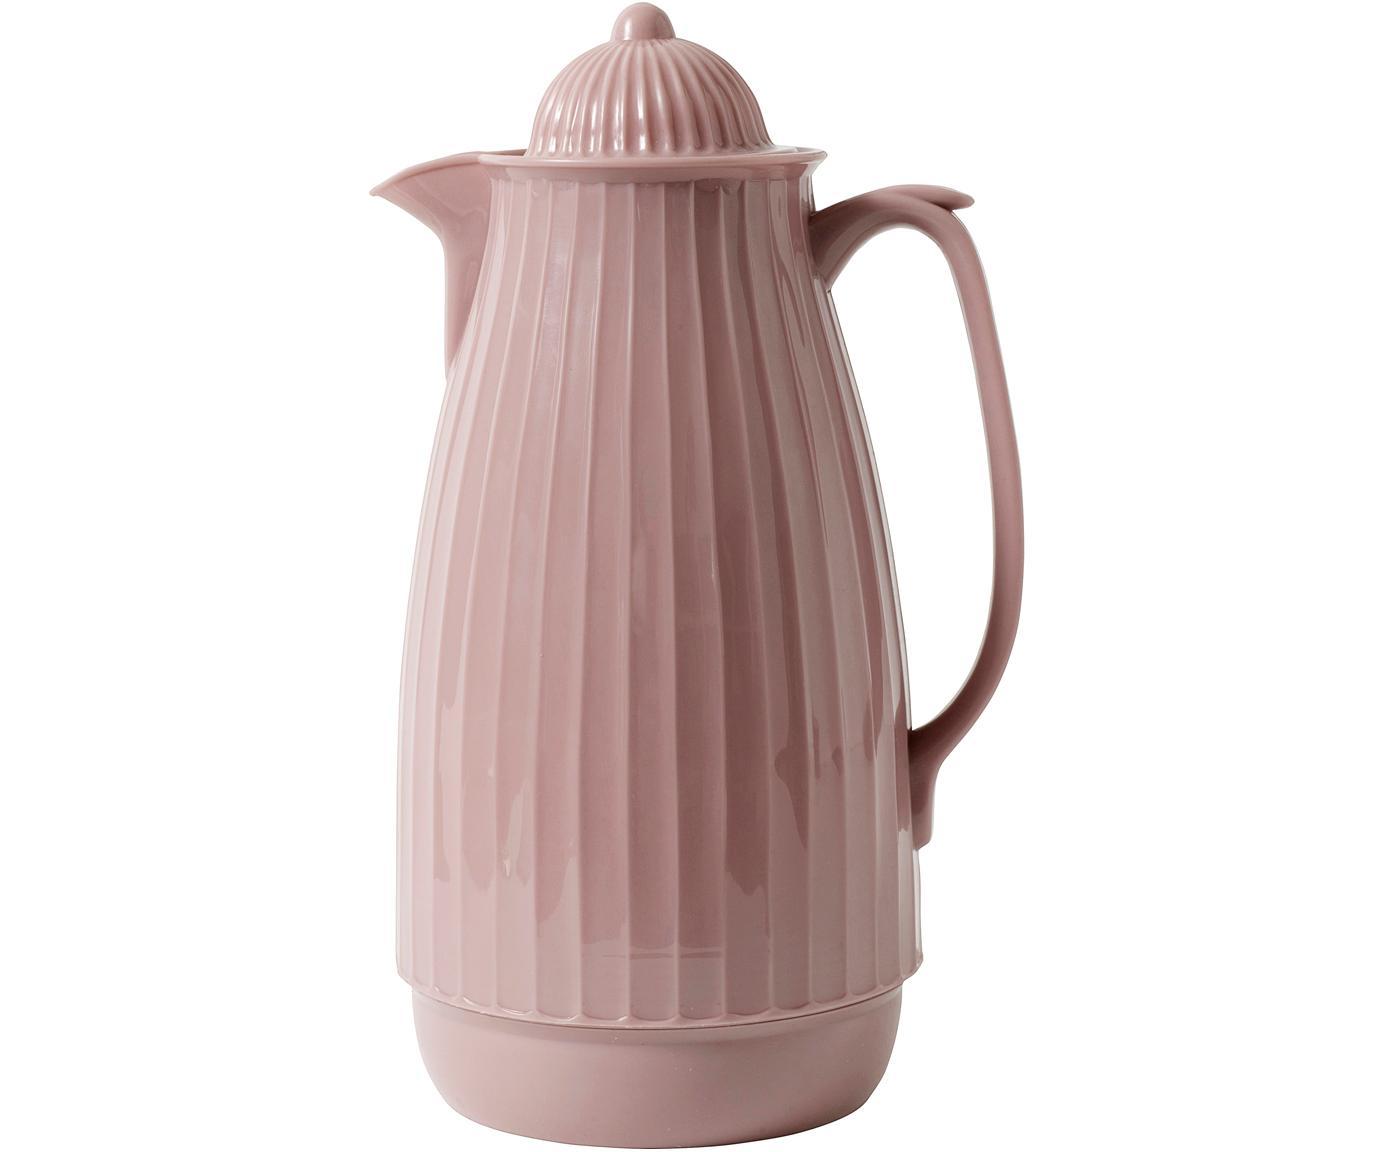 Isolierkanne Juggie, Außen: Kunststoff, Innen: Glas, Rosa, 1 L